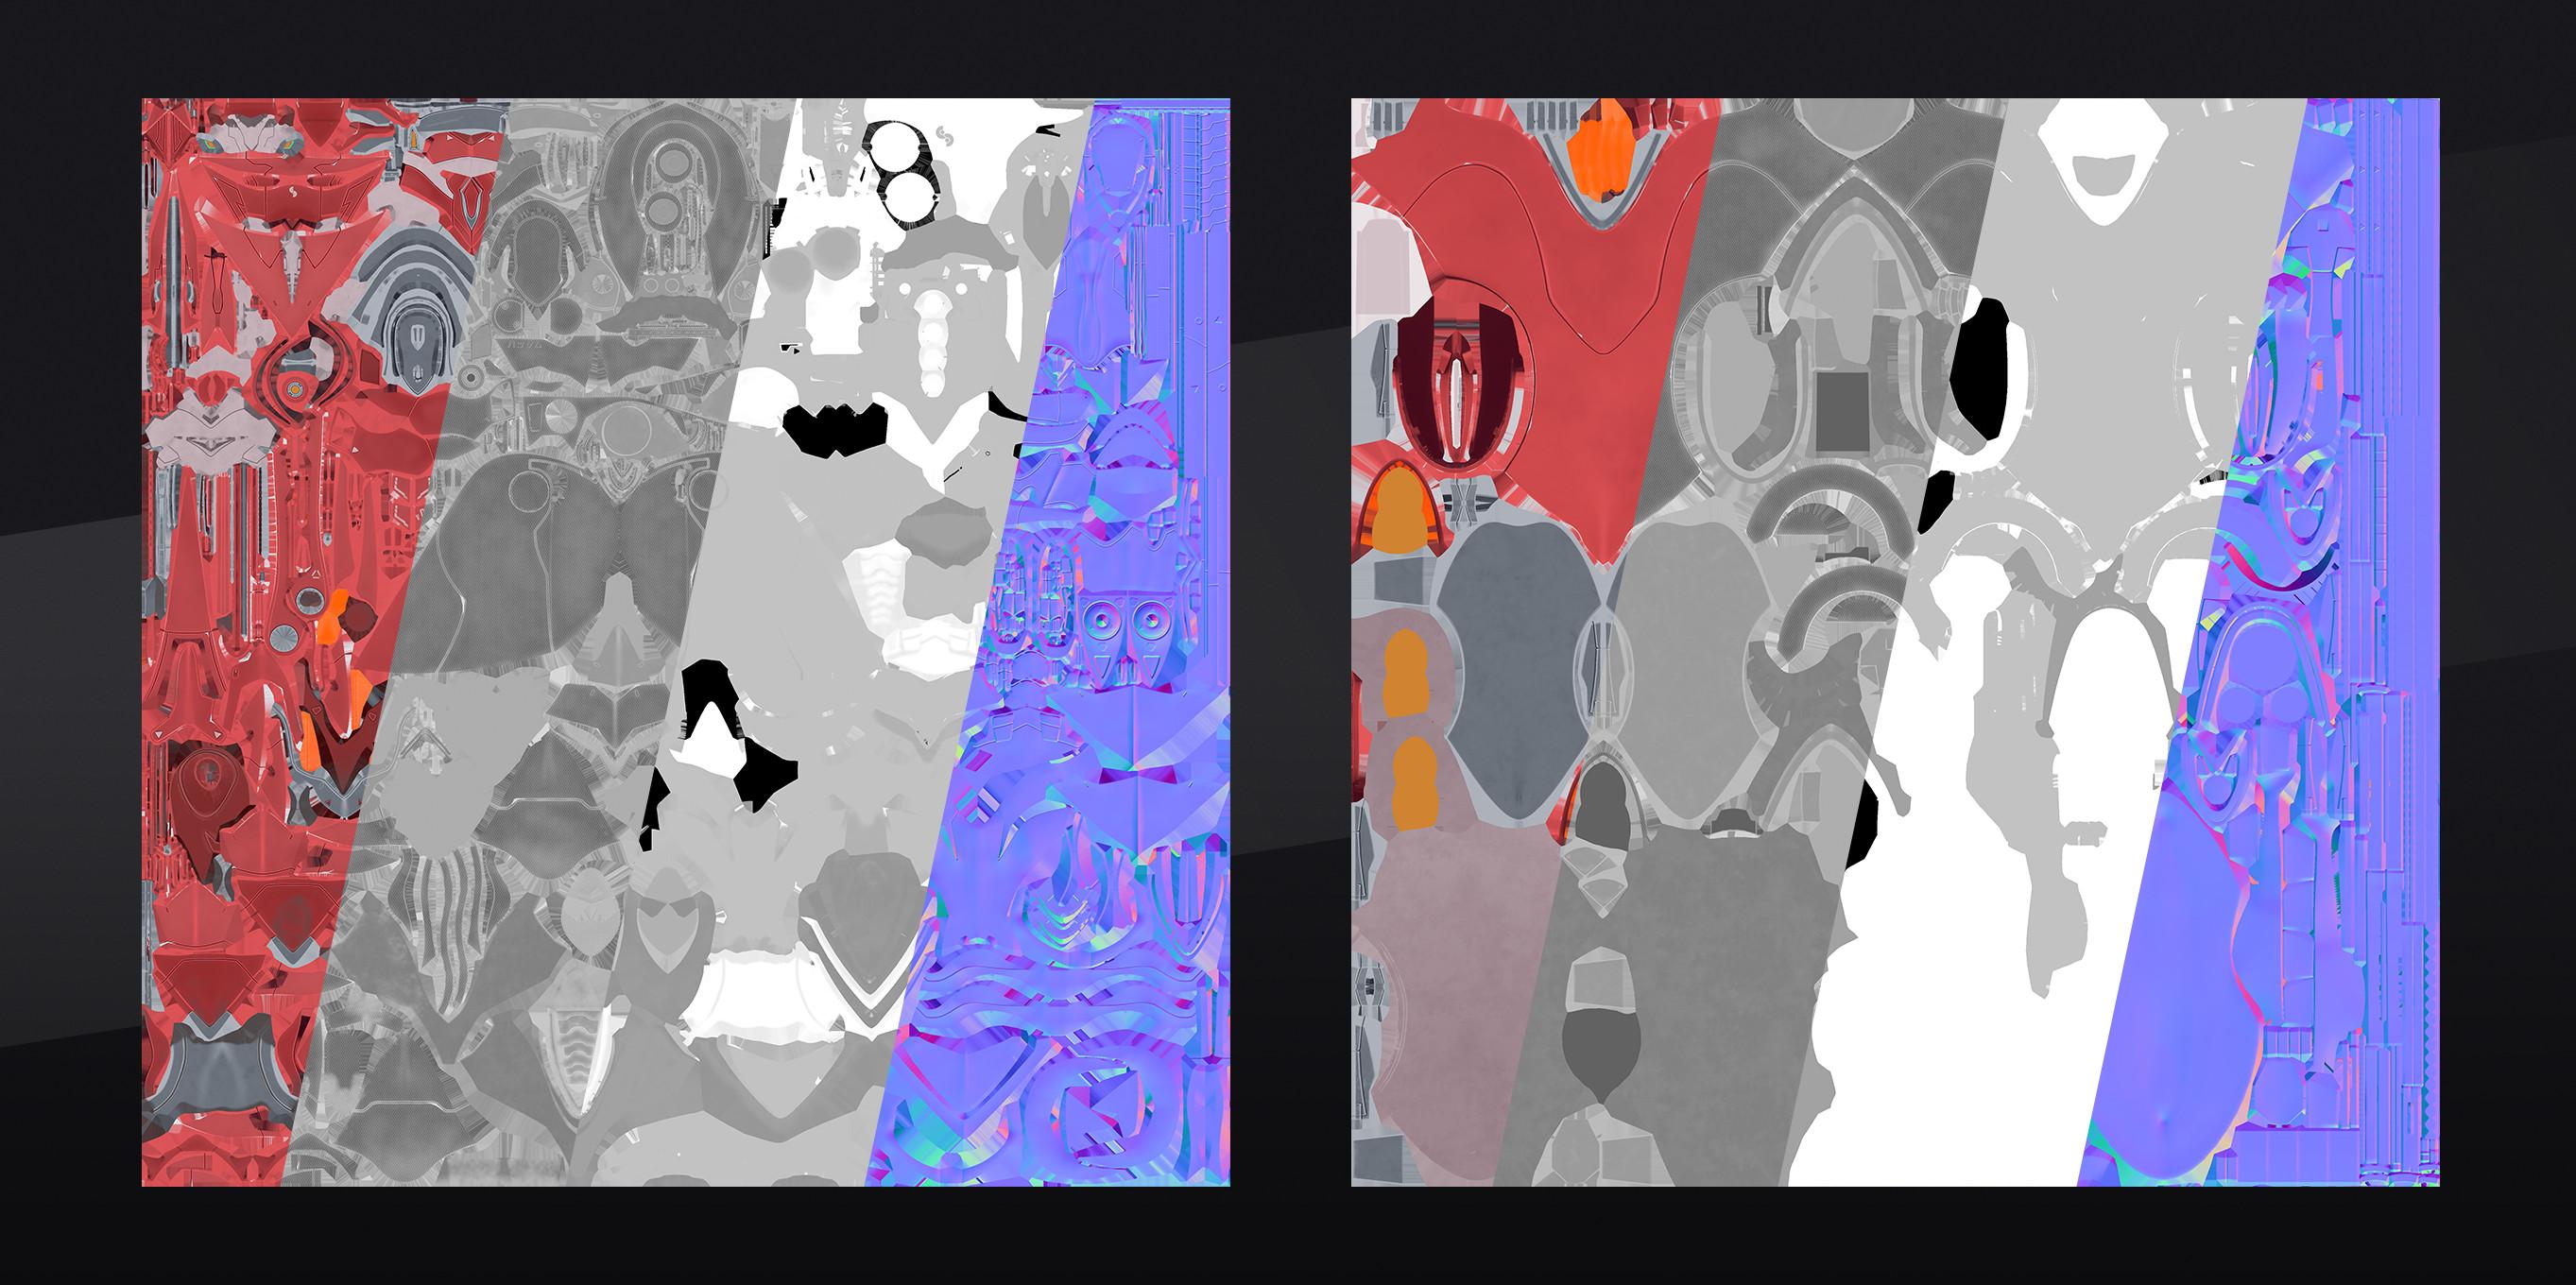 2x 4k Texture Sets